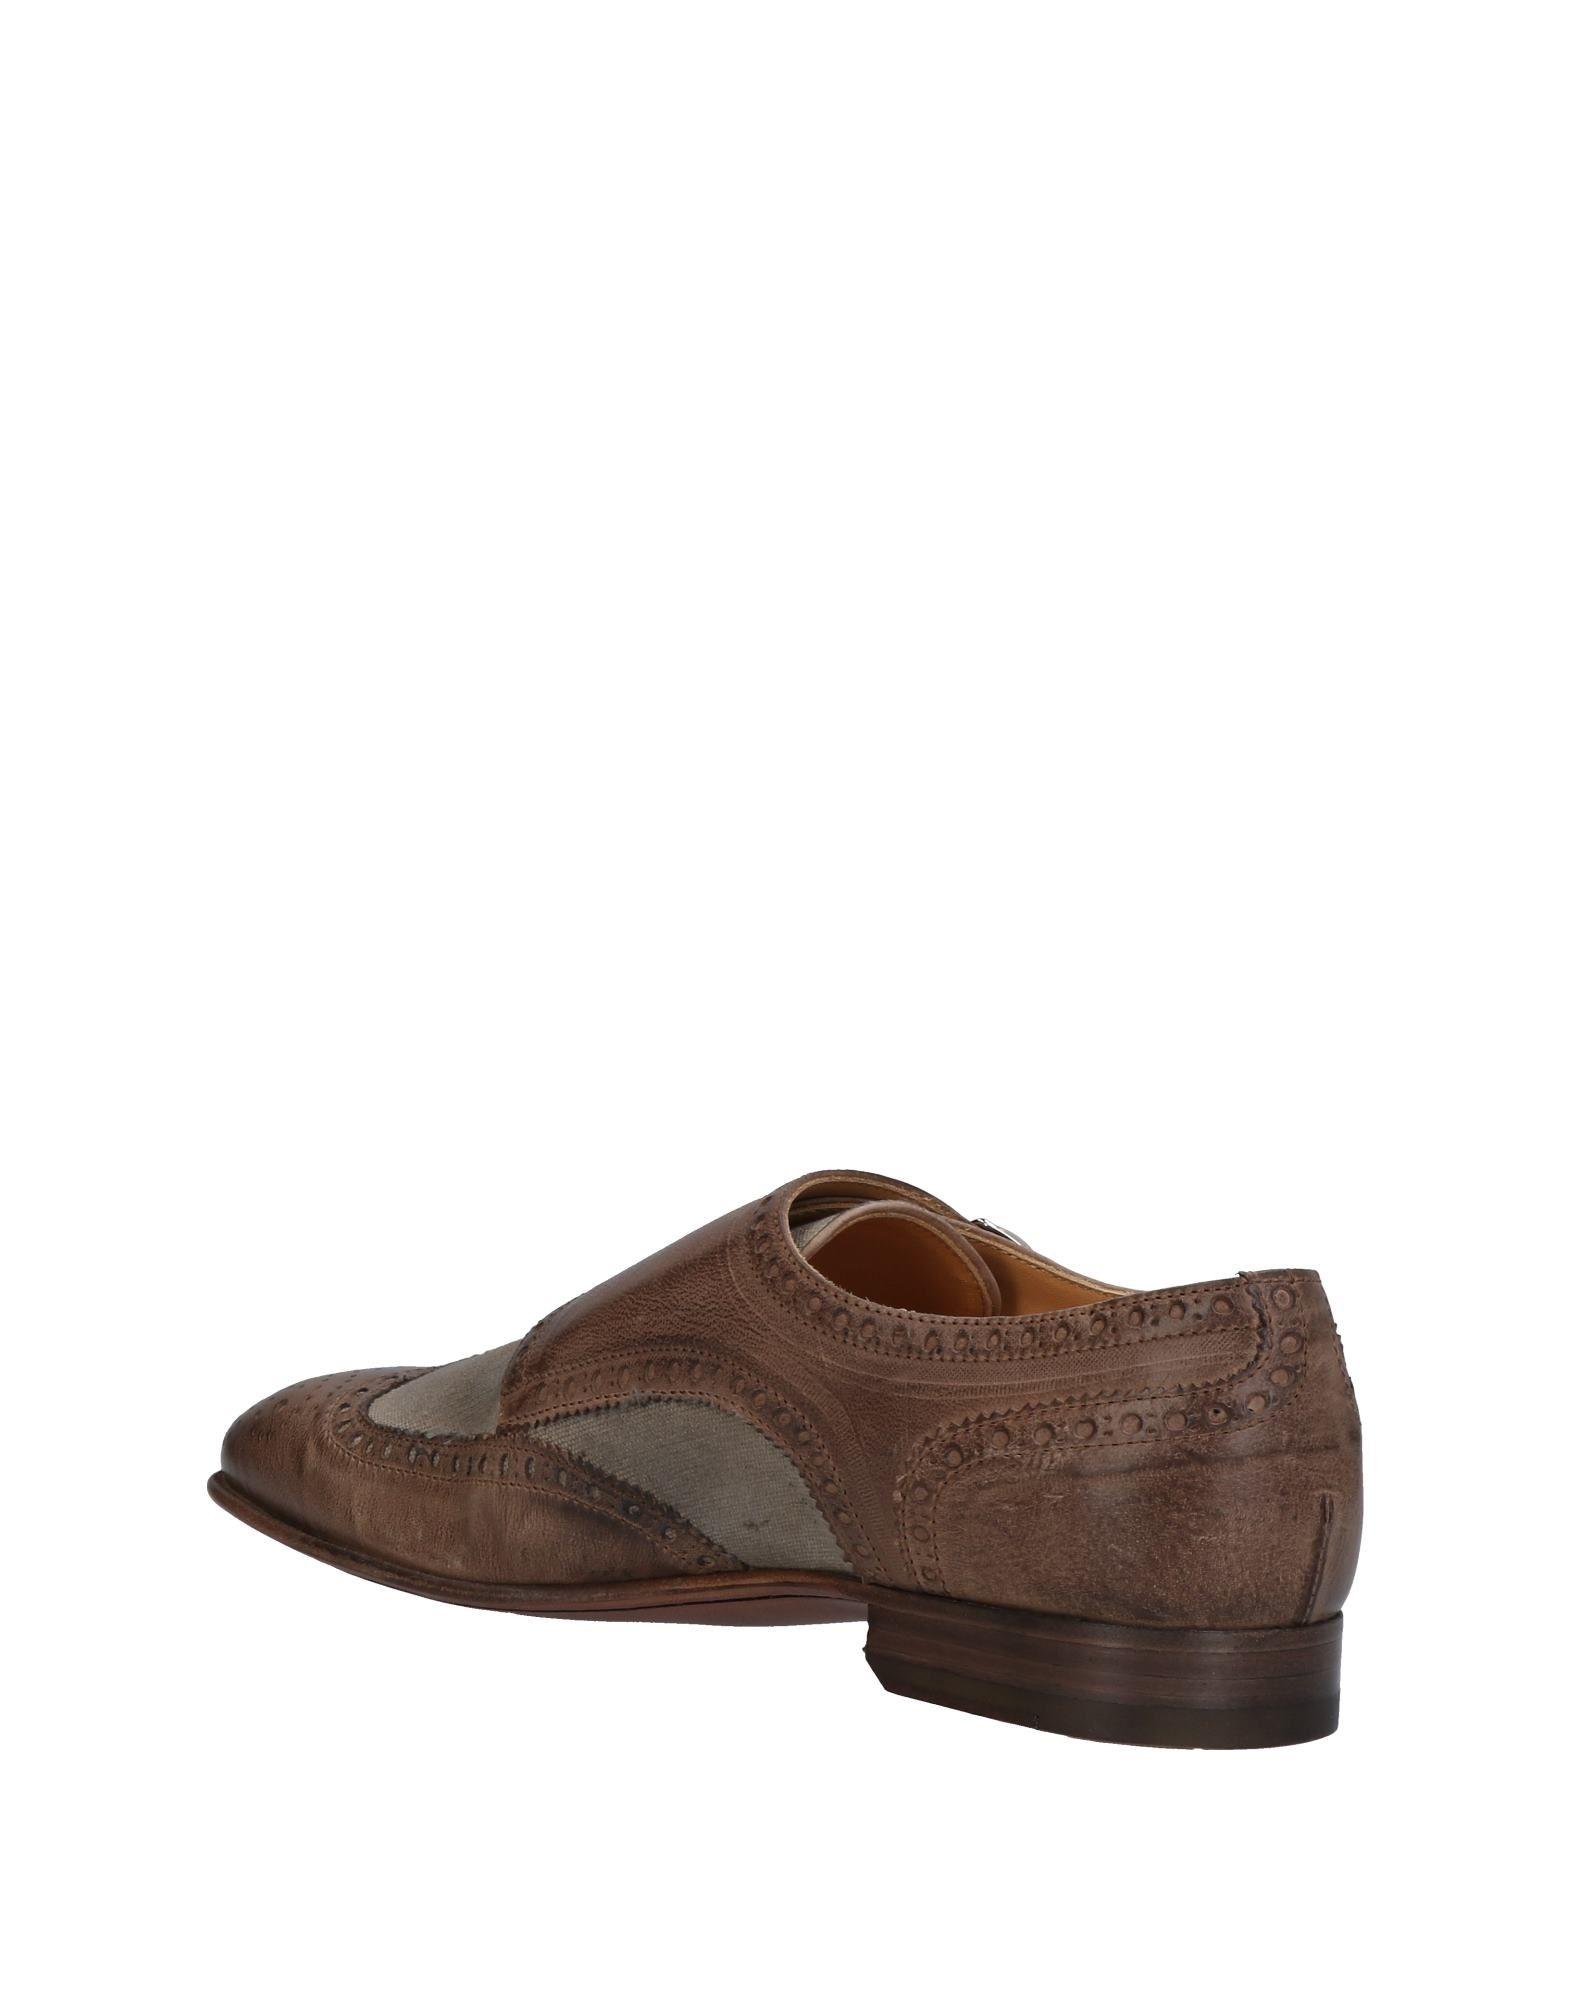 Herren Migliore Mokassins Herren   11425598WS Heiße Schuhe f175cd